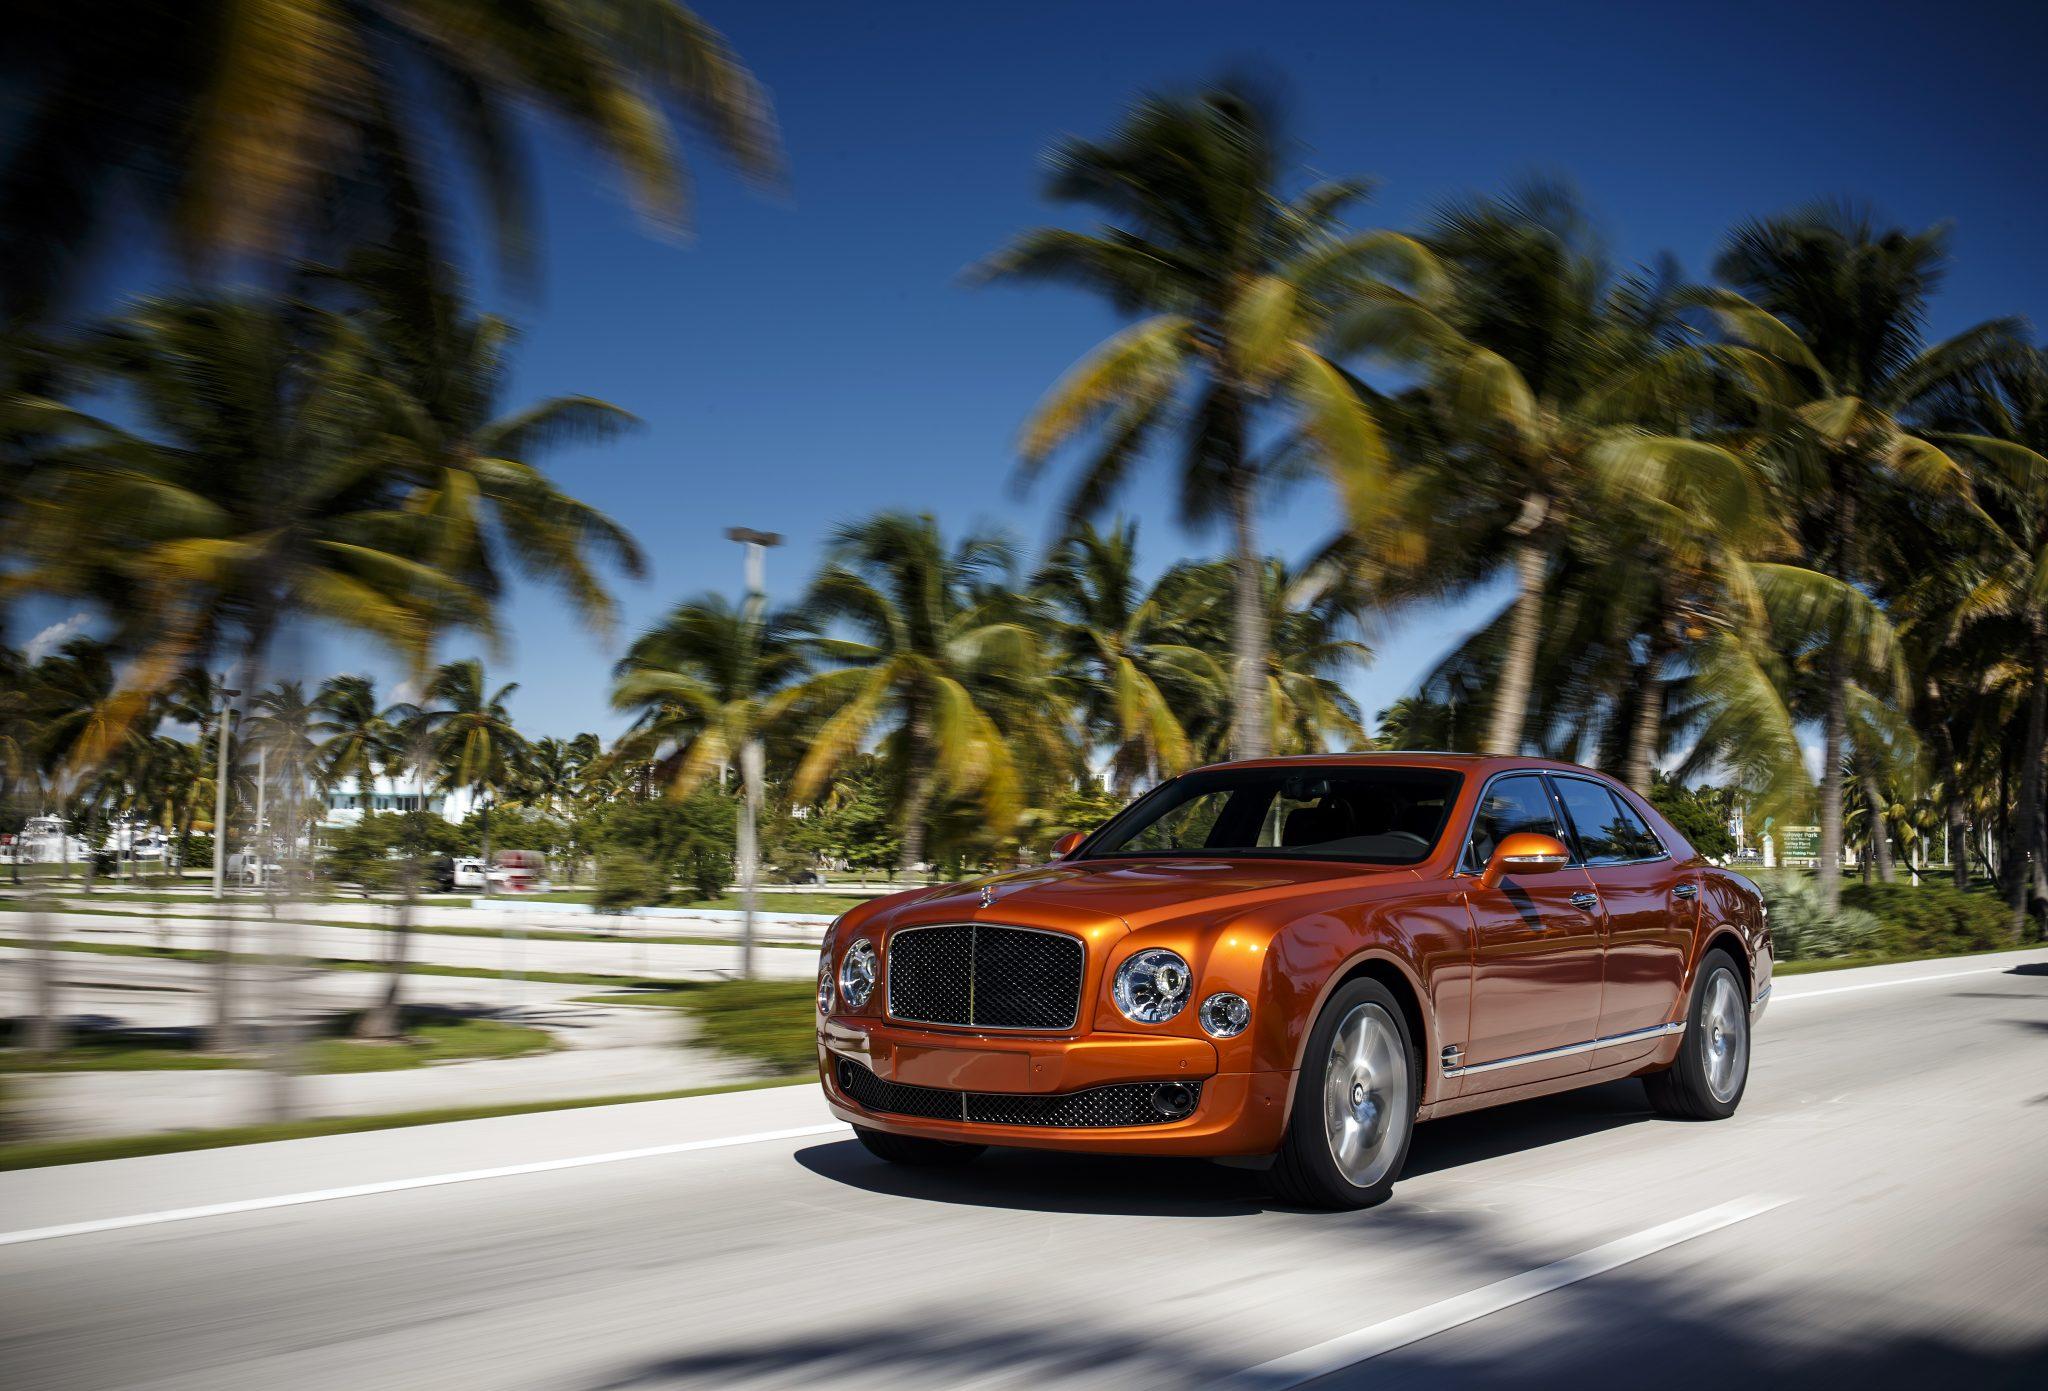 A 2015 Bentley Mulsanne Speed cruising through a palm tree lined street